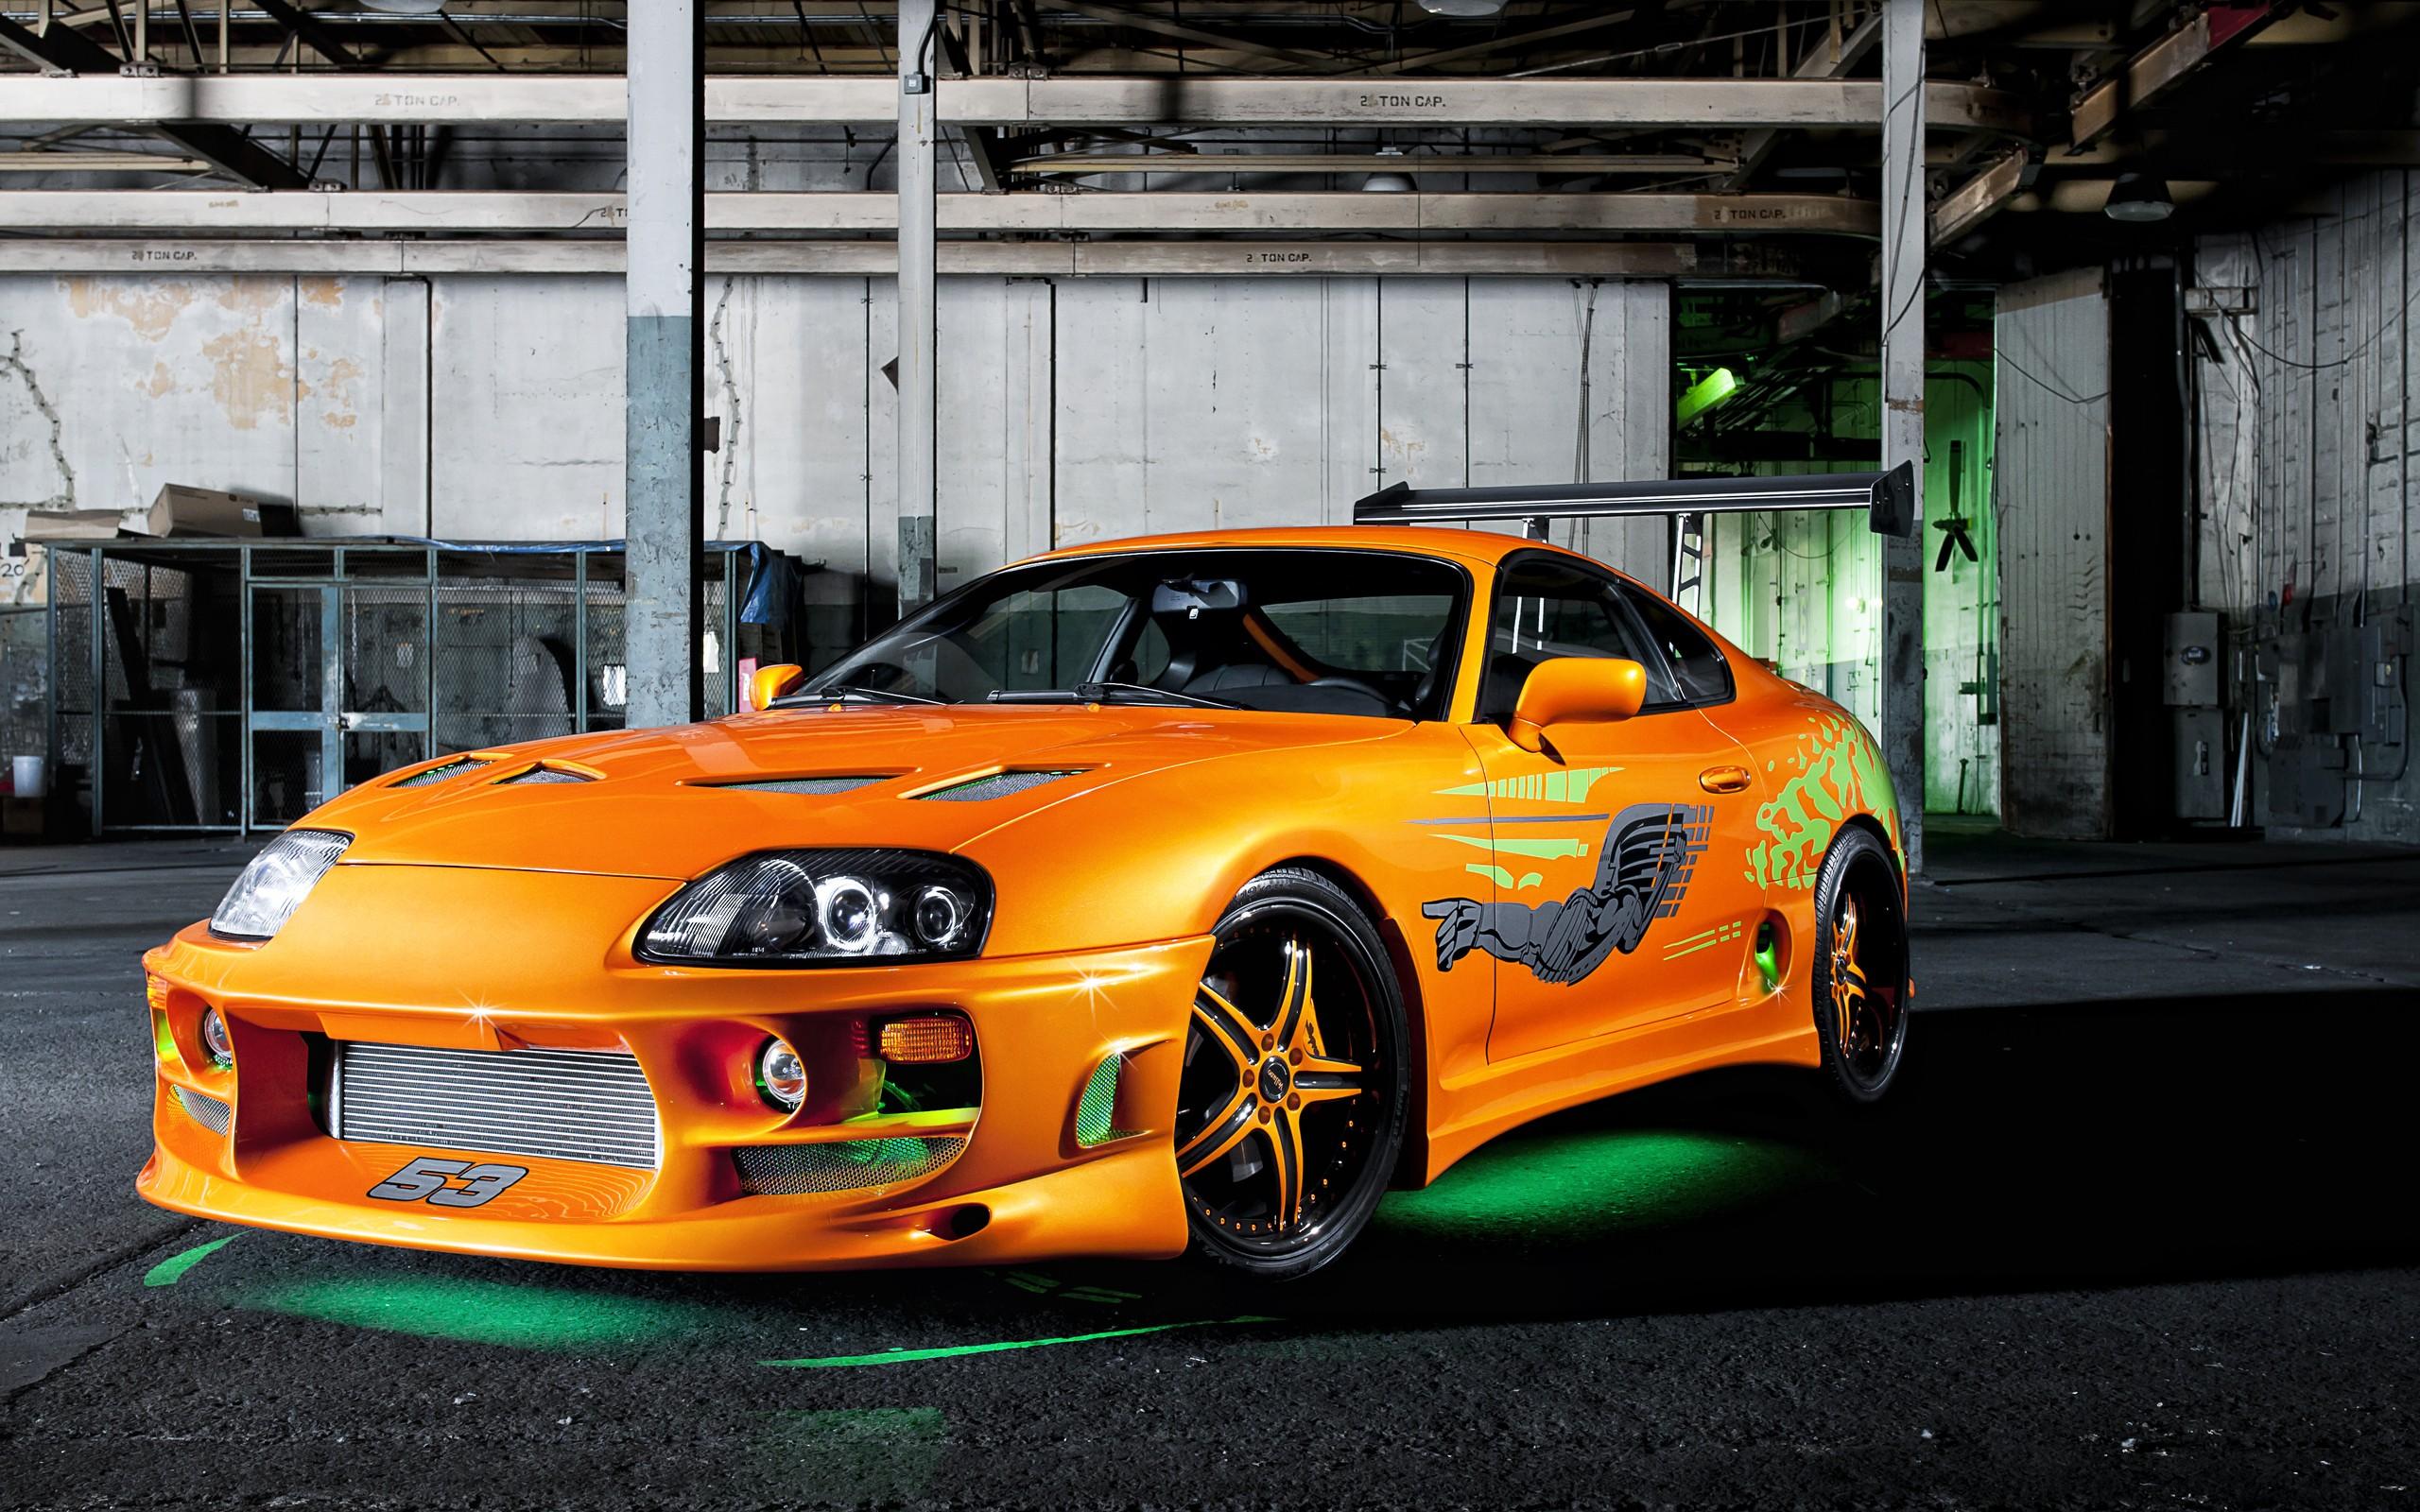 Awesome Toyota Supra